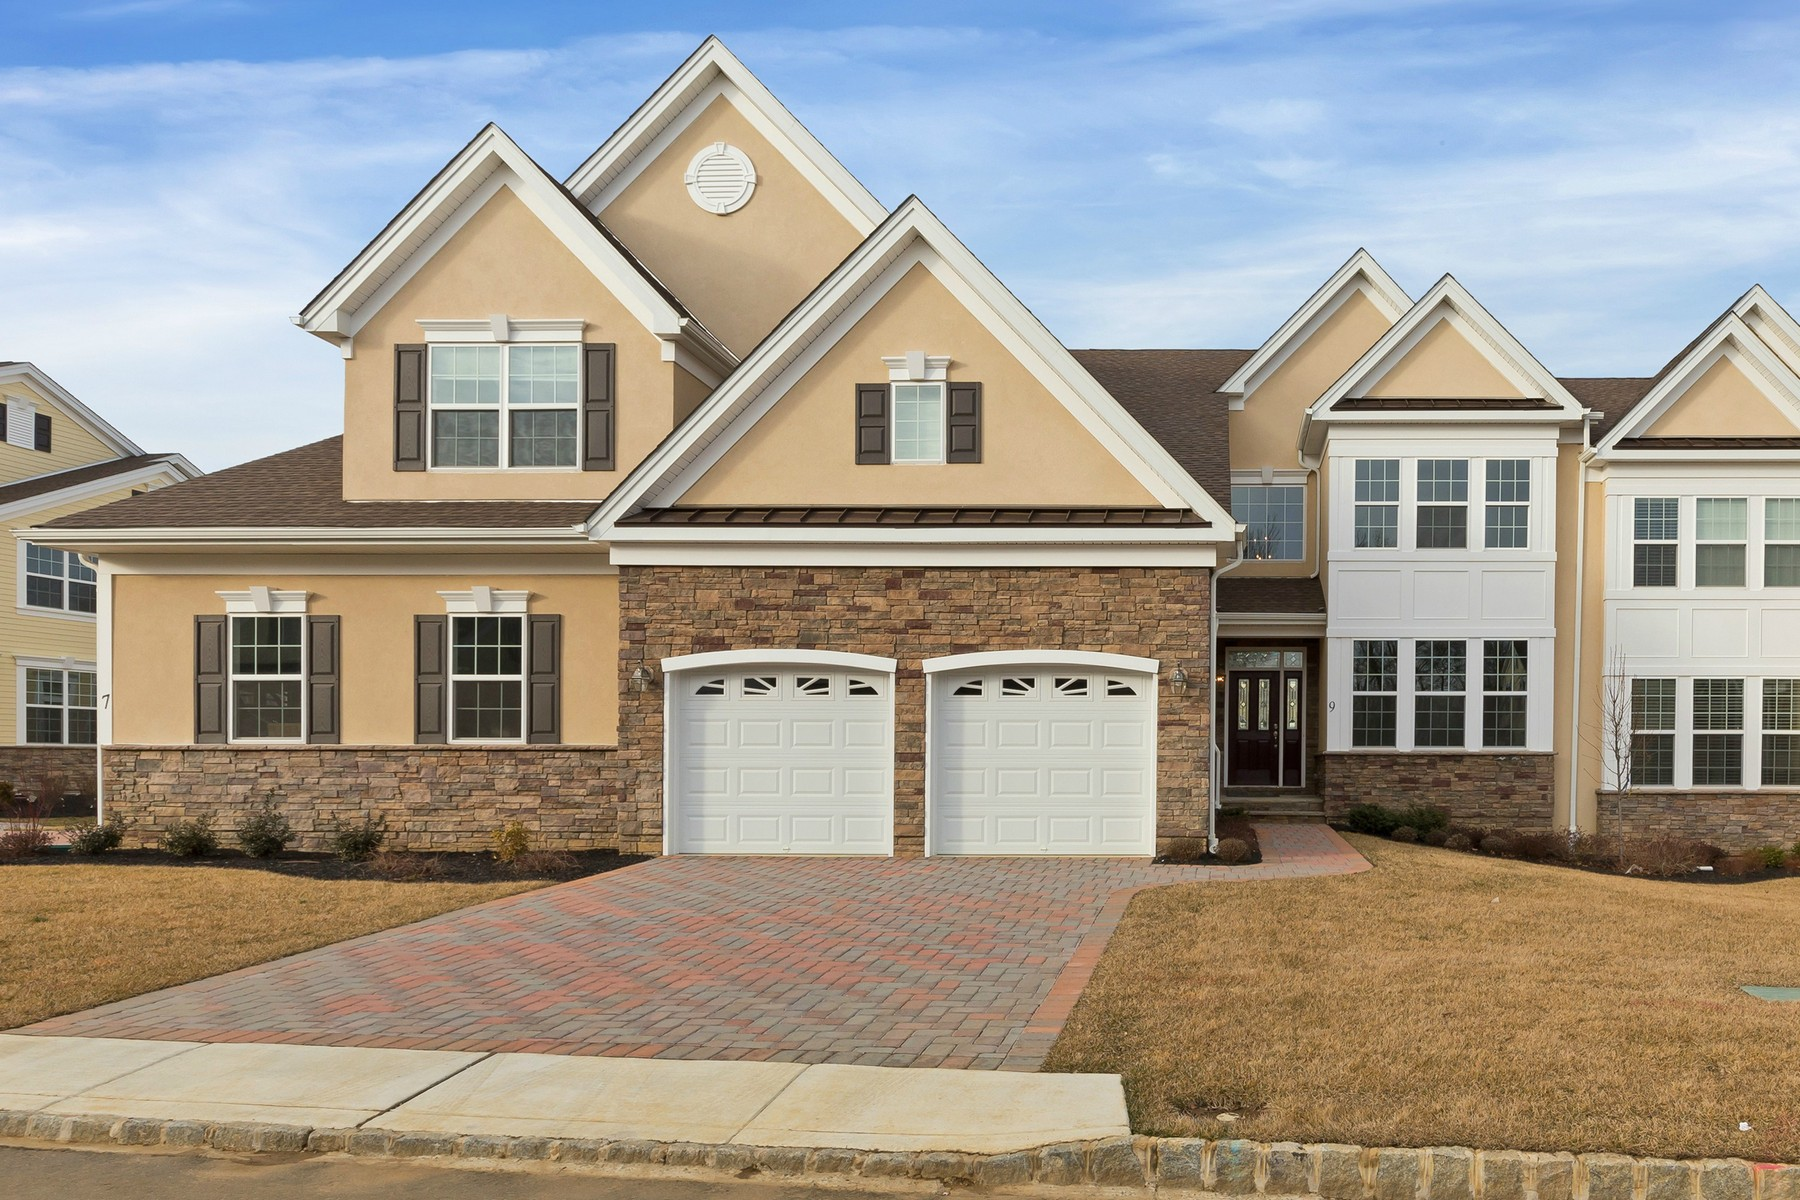 Condominium for Sale at 9 Rebecca Ann Ct, Tinton Falls 9 Rebecca Ann Court Tinton Falls, New Jersey, 07724 United States